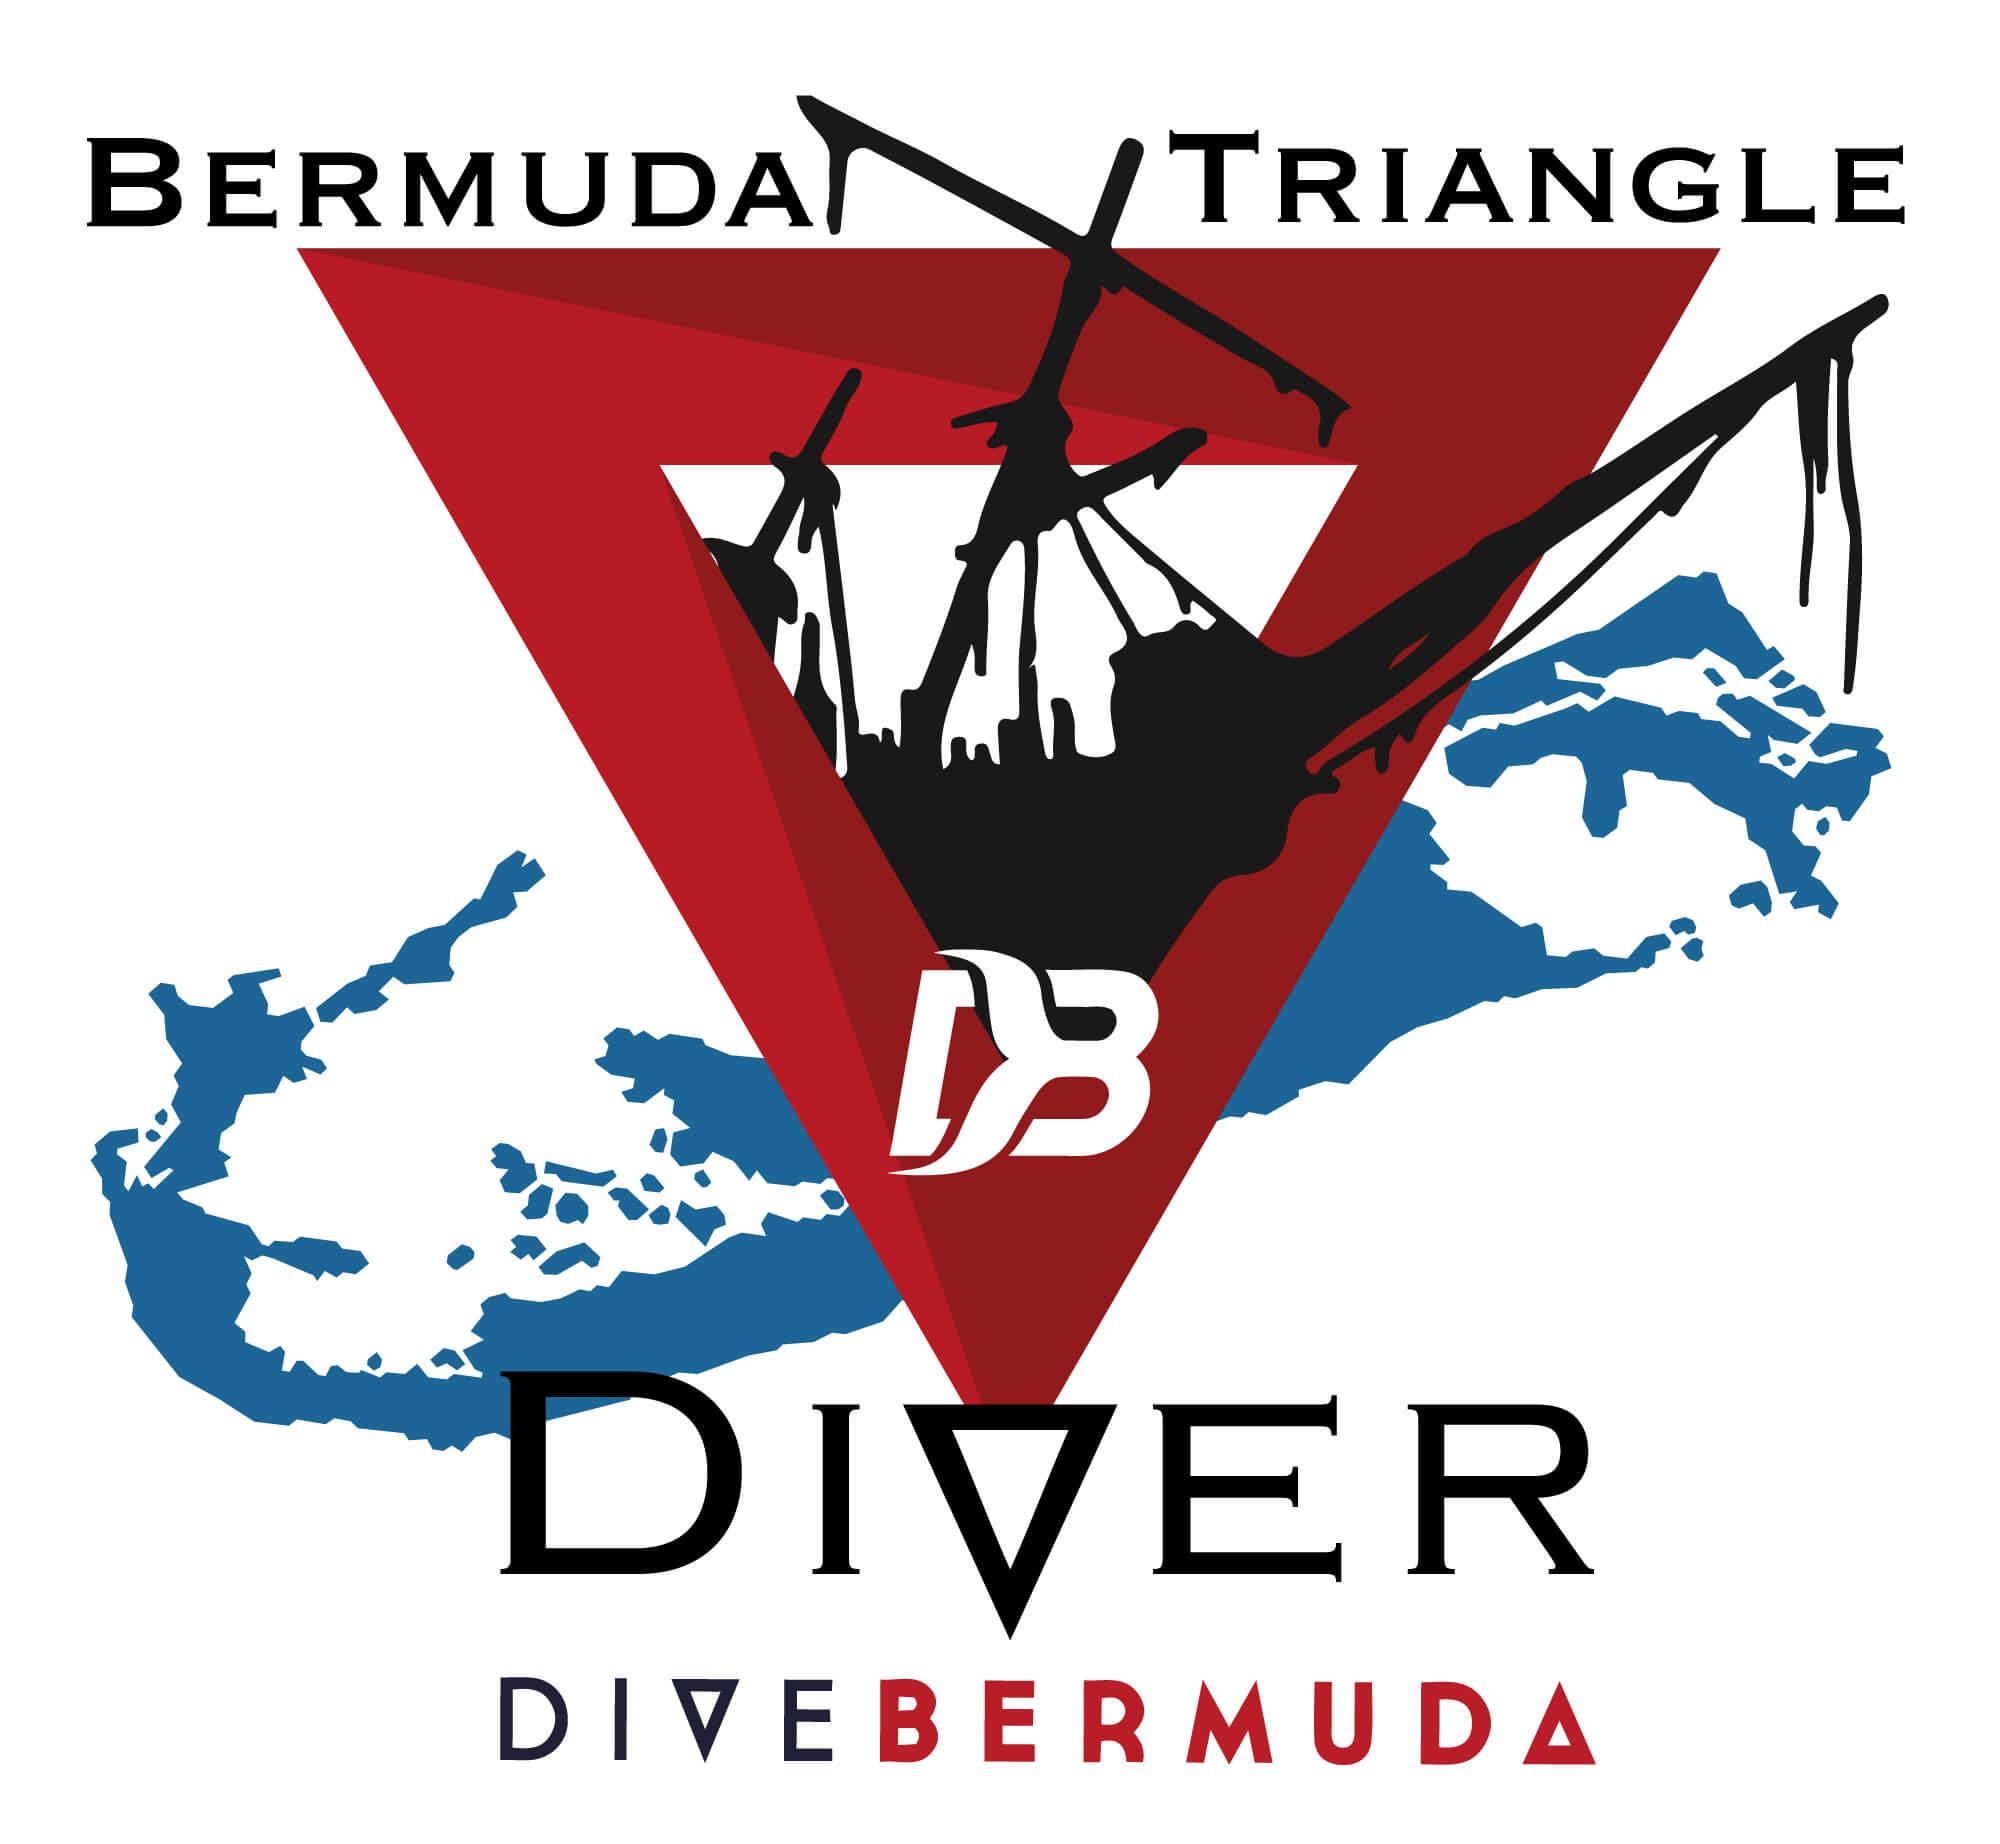 Dive Bermuda Grotto Bay Resort Bermuda Triangle Diver mystery PAD.jpg